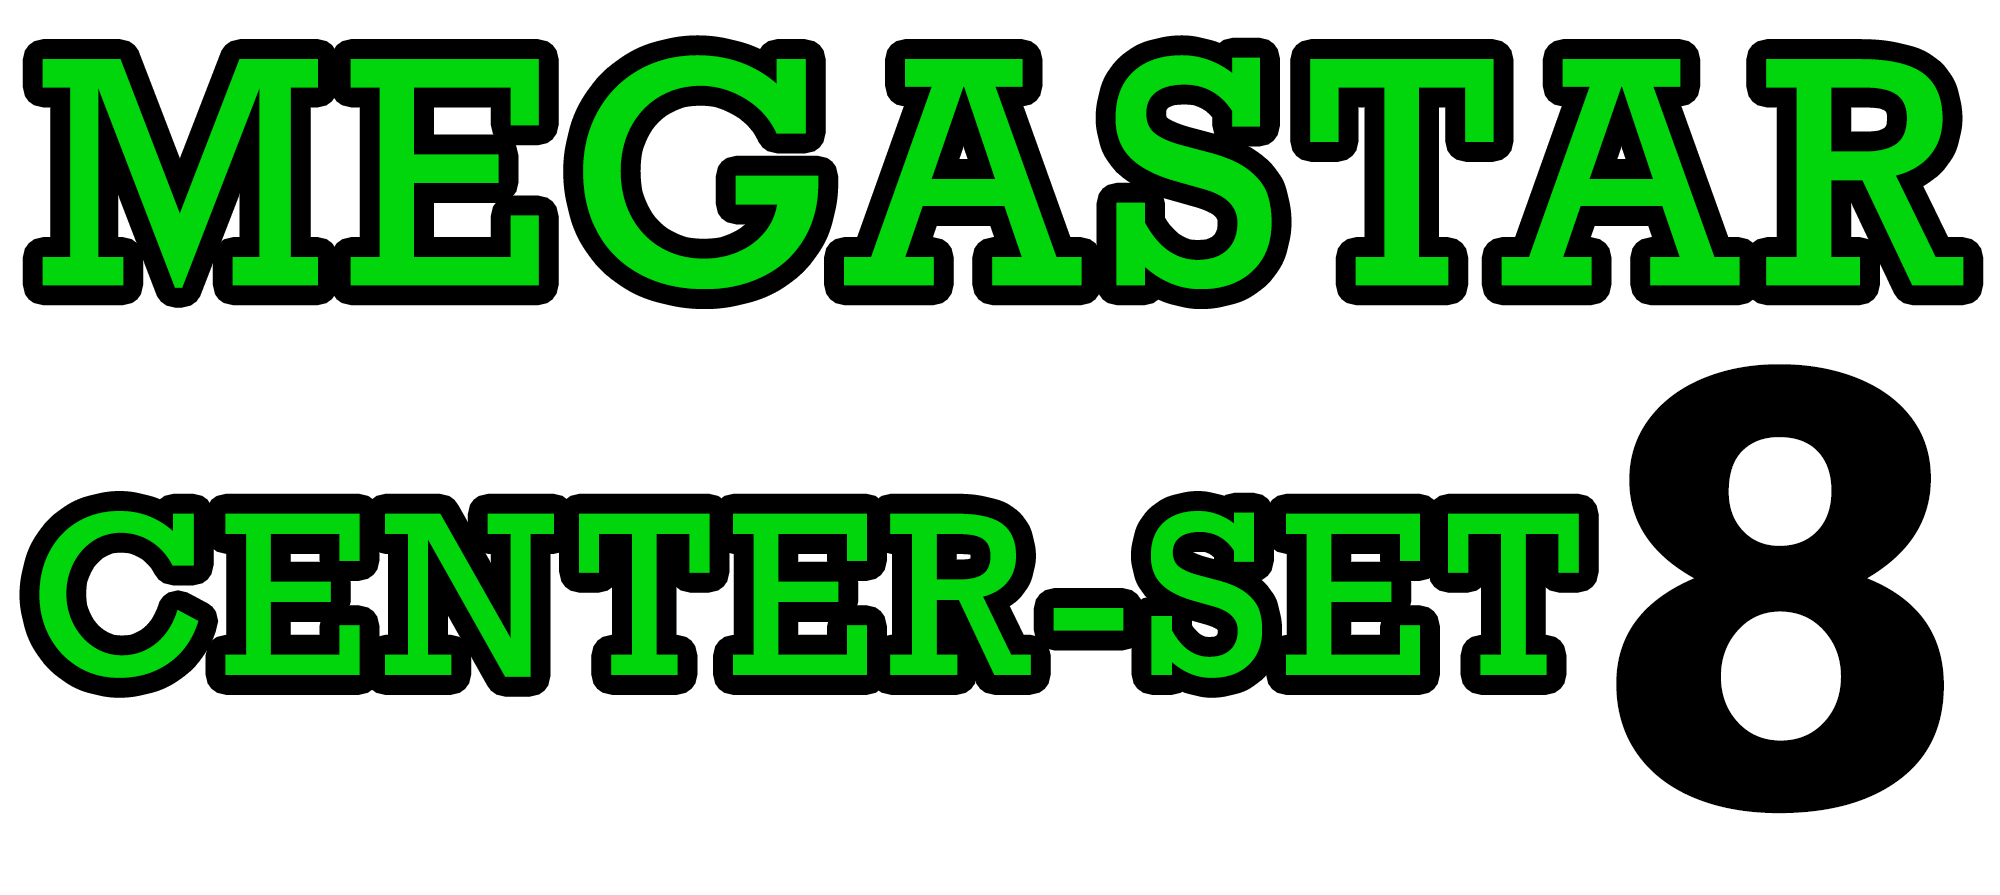 Custom MEGASTAR Hub with Low Profile 6.5 Inch URBAN Treads Tyres